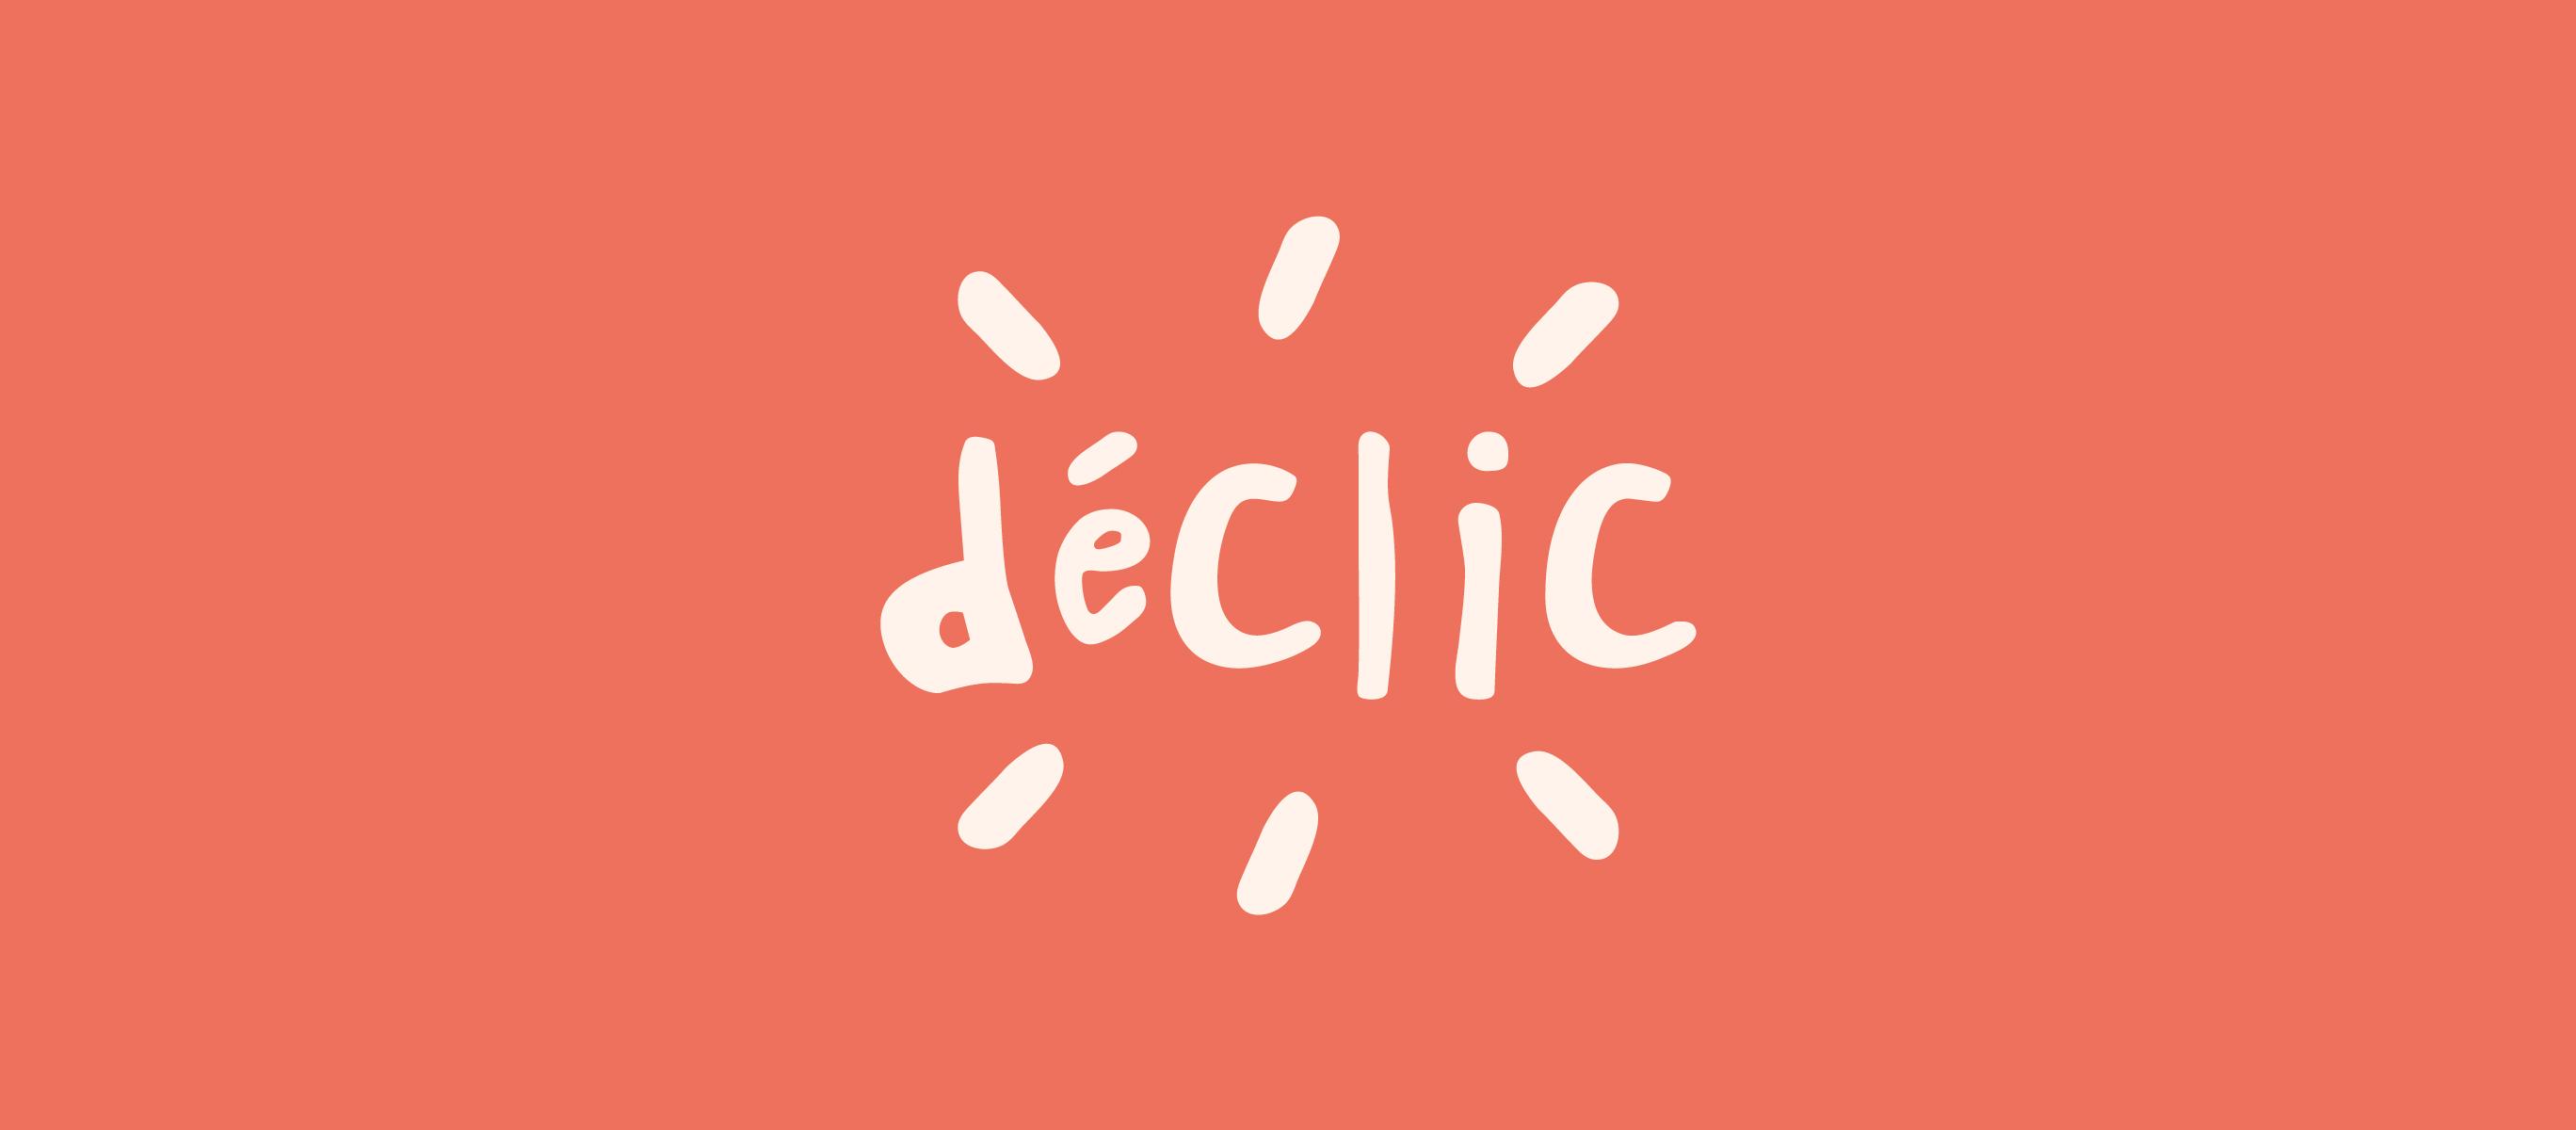 Declic webserie Culot Creative media féministe